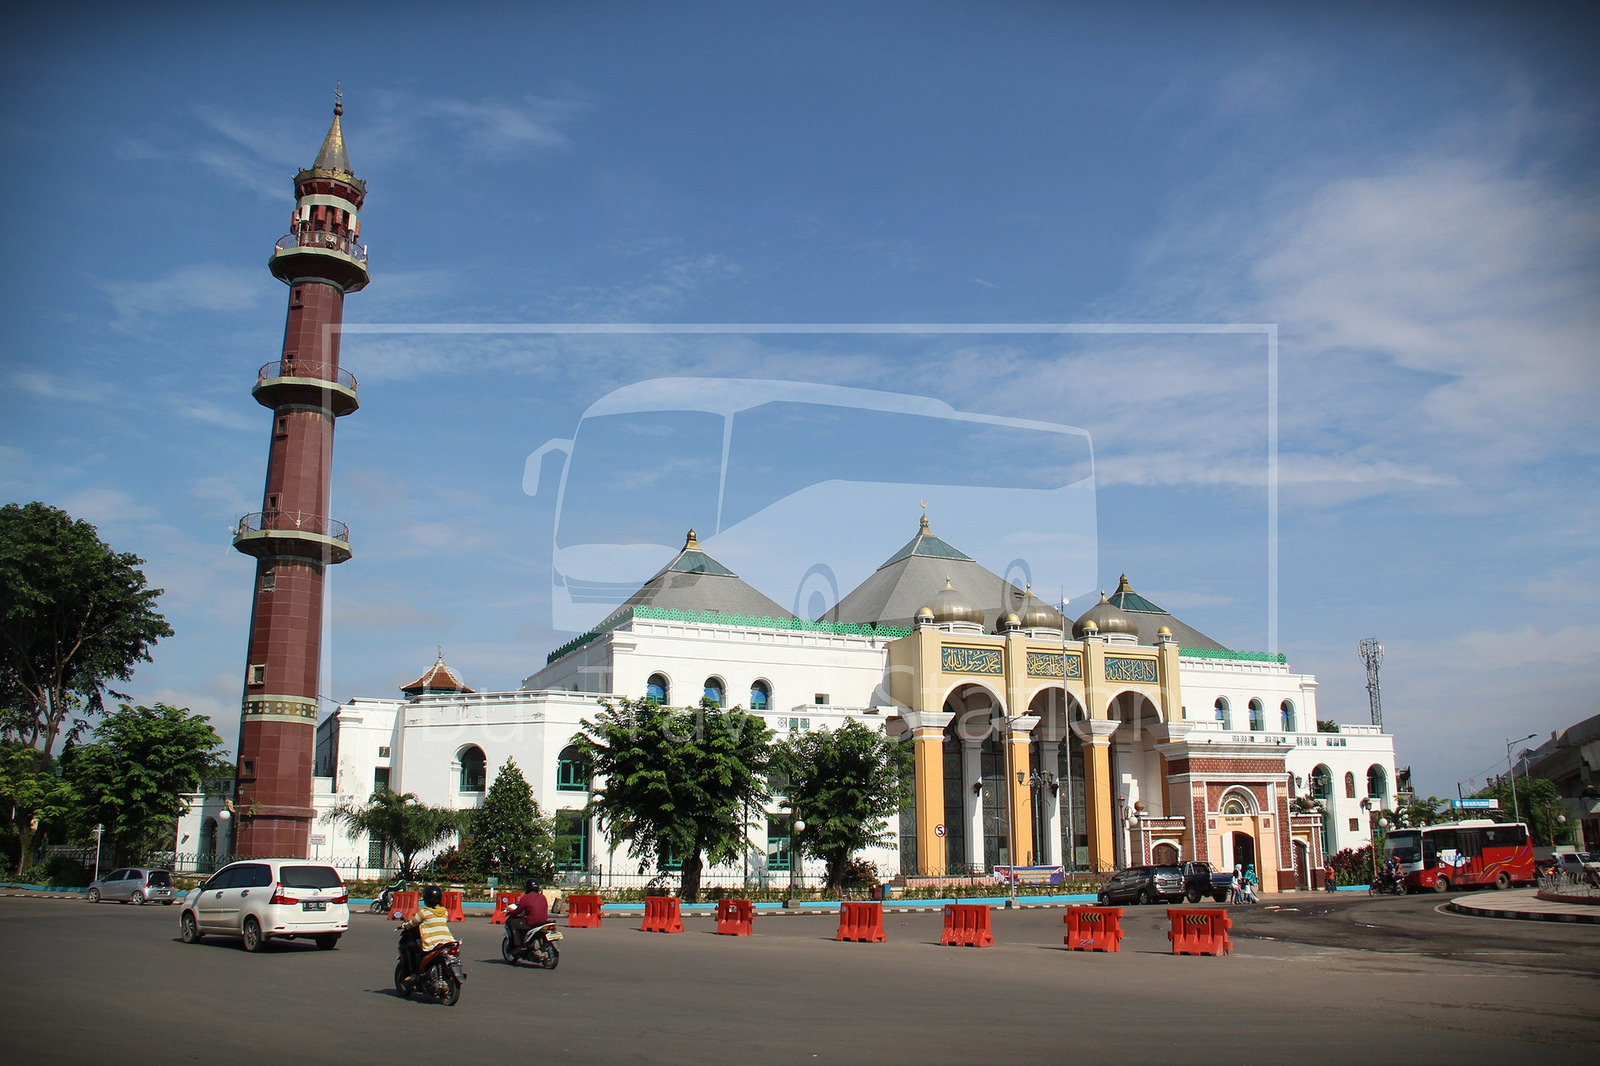 Masjid Agung Palembang Bustravel Station Area Home Sultan Mahmud Badaruddin